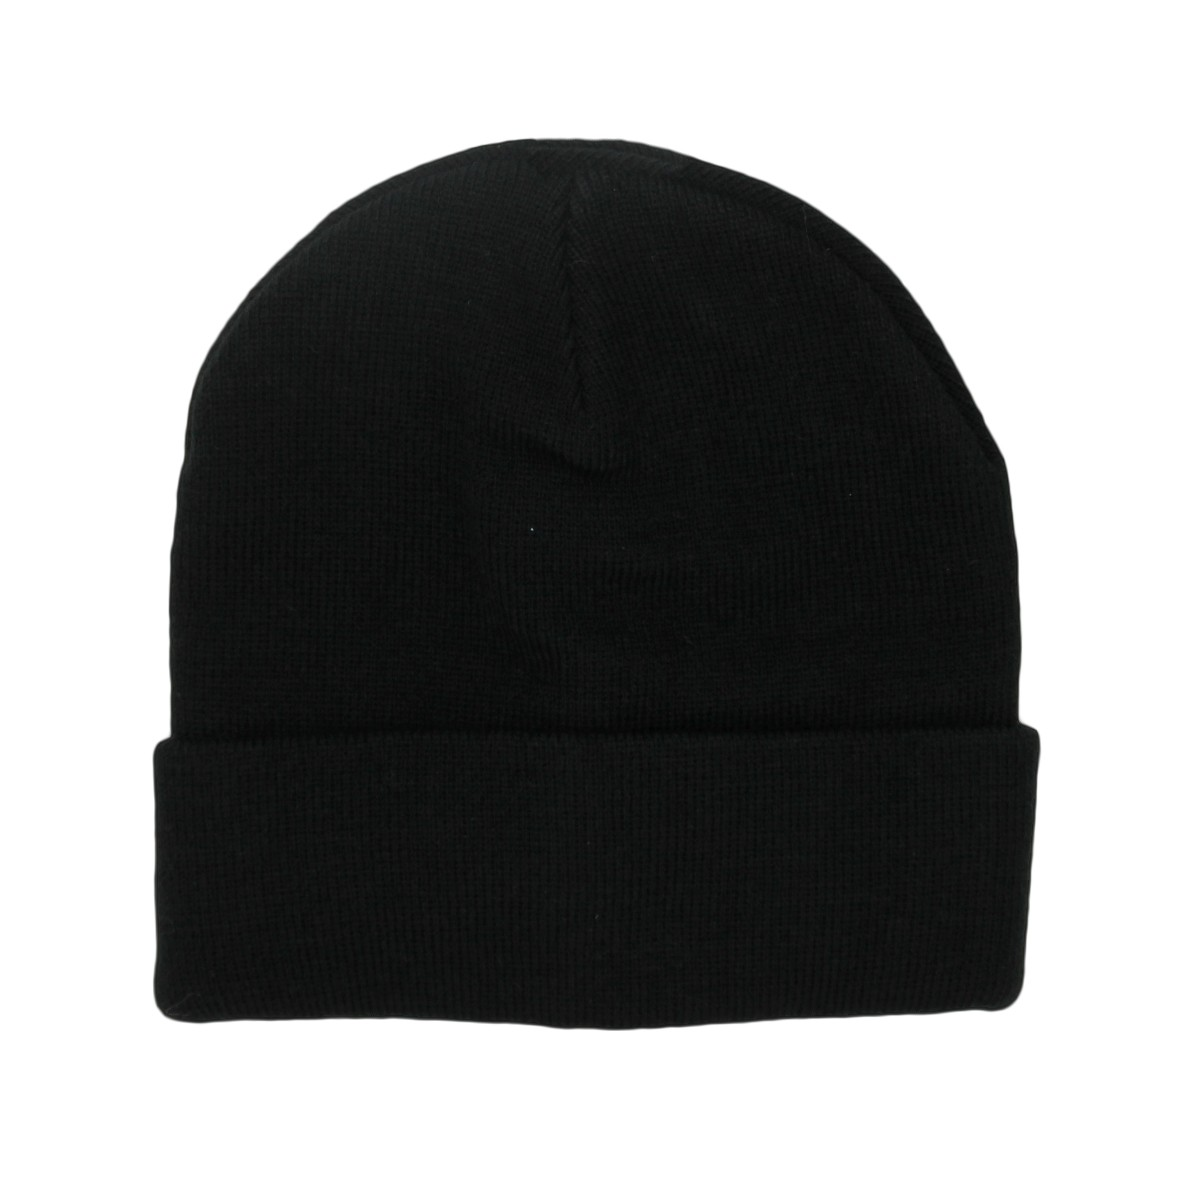 Mütze Basic schwarz